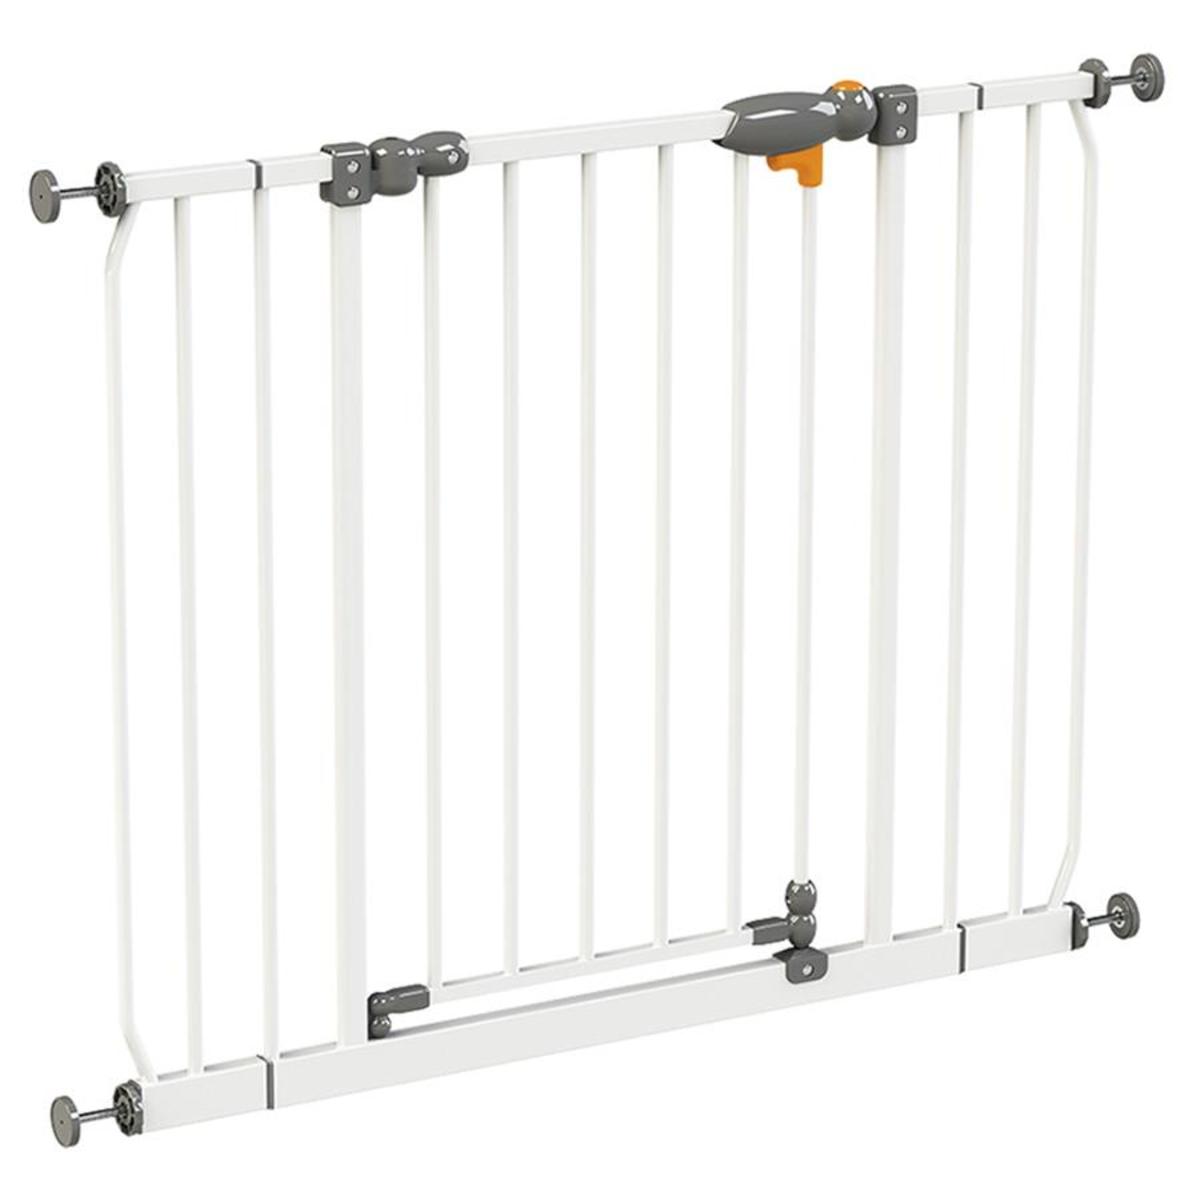 kmart bike rack for car